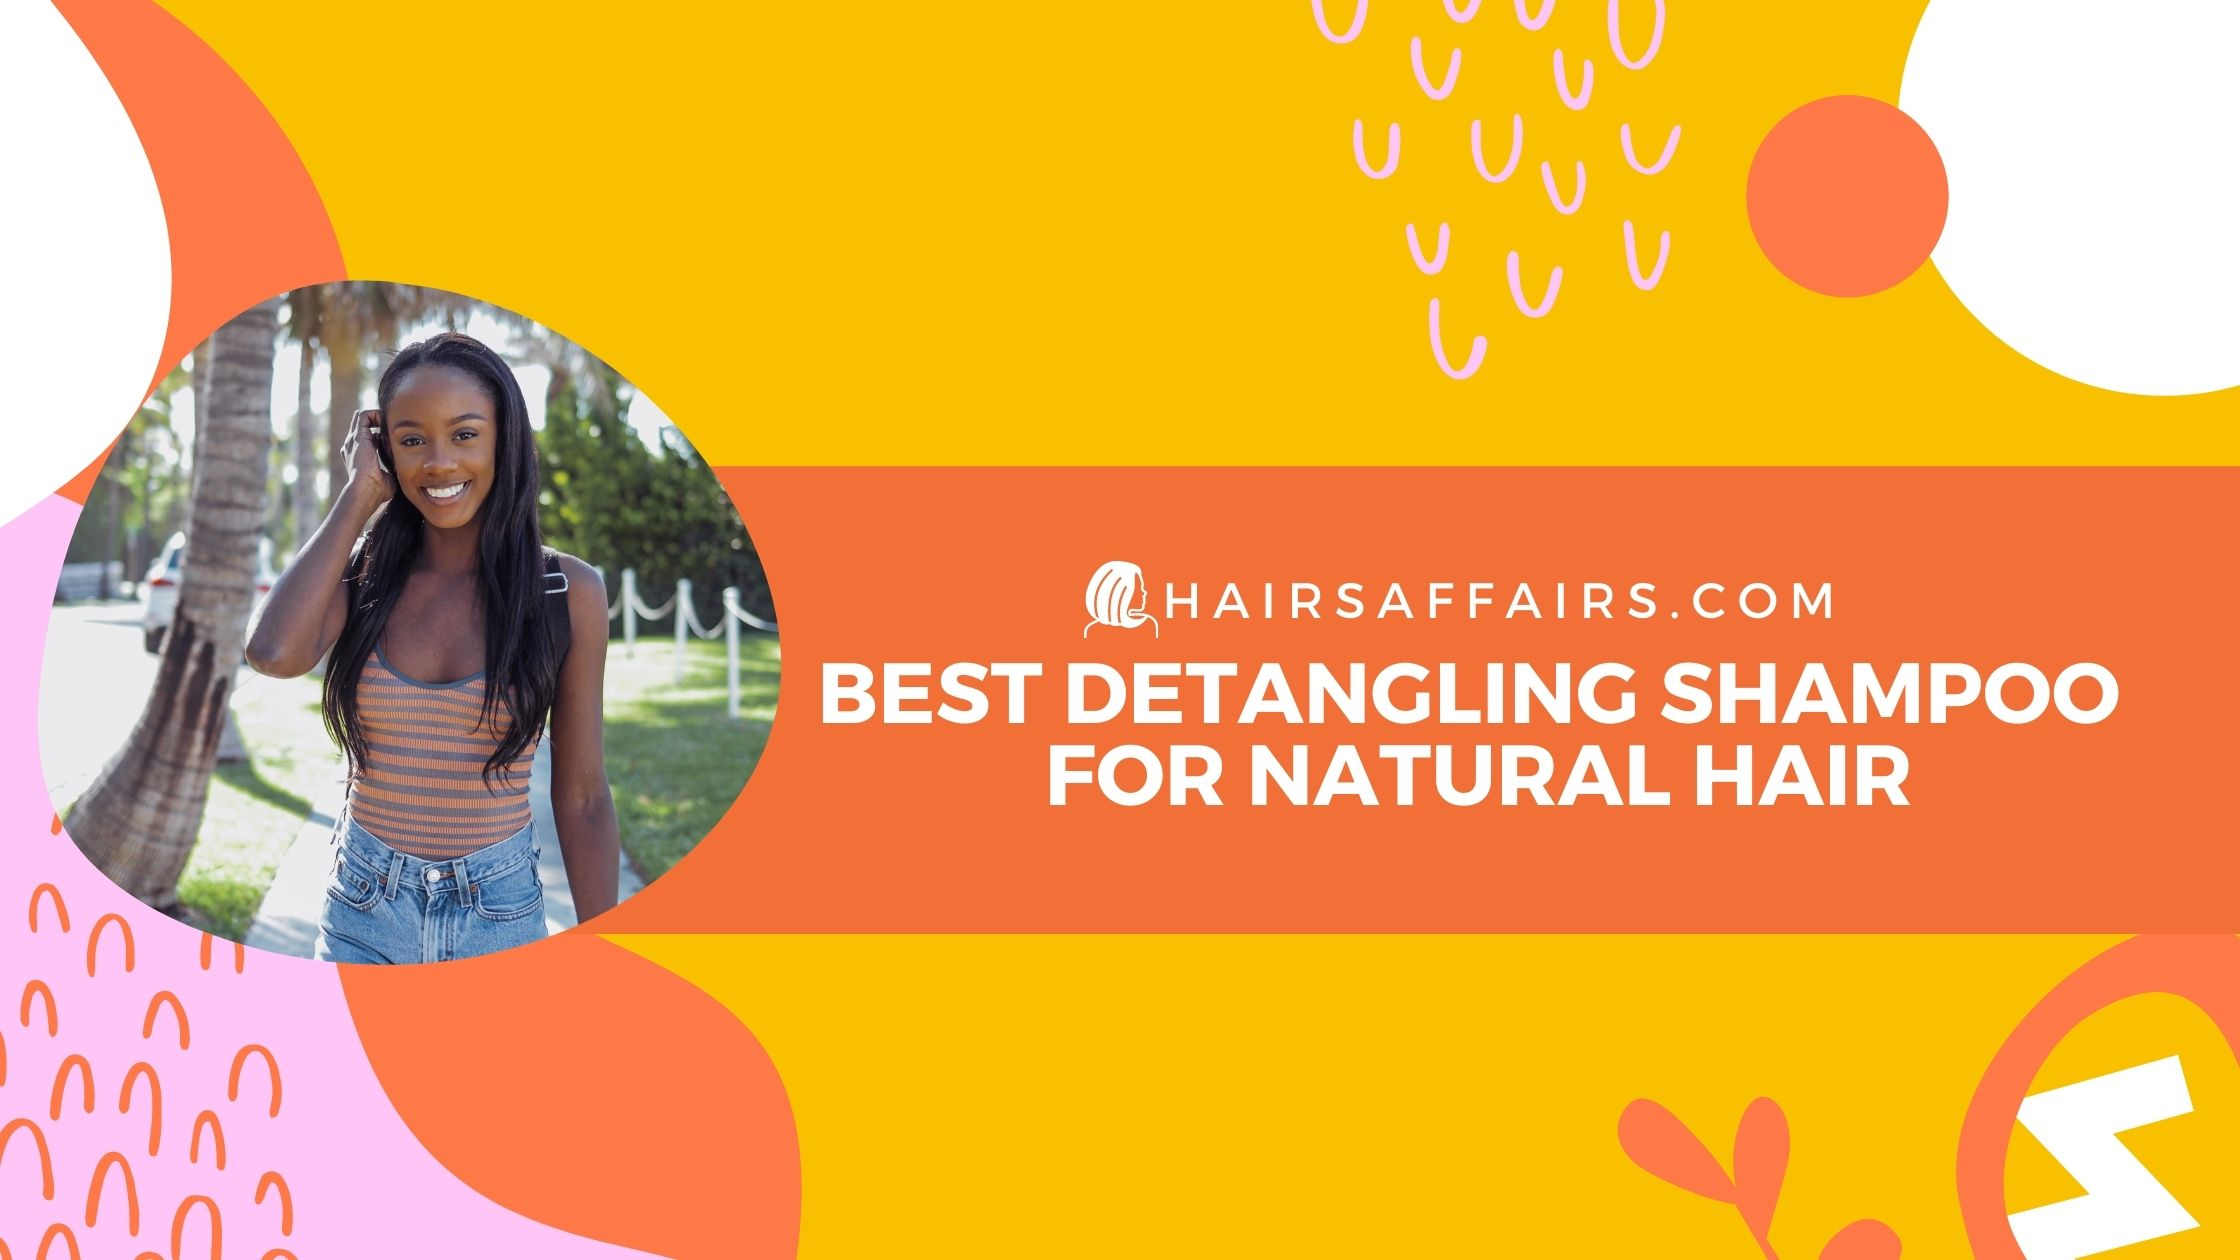 best detangling shampoo for natural hair